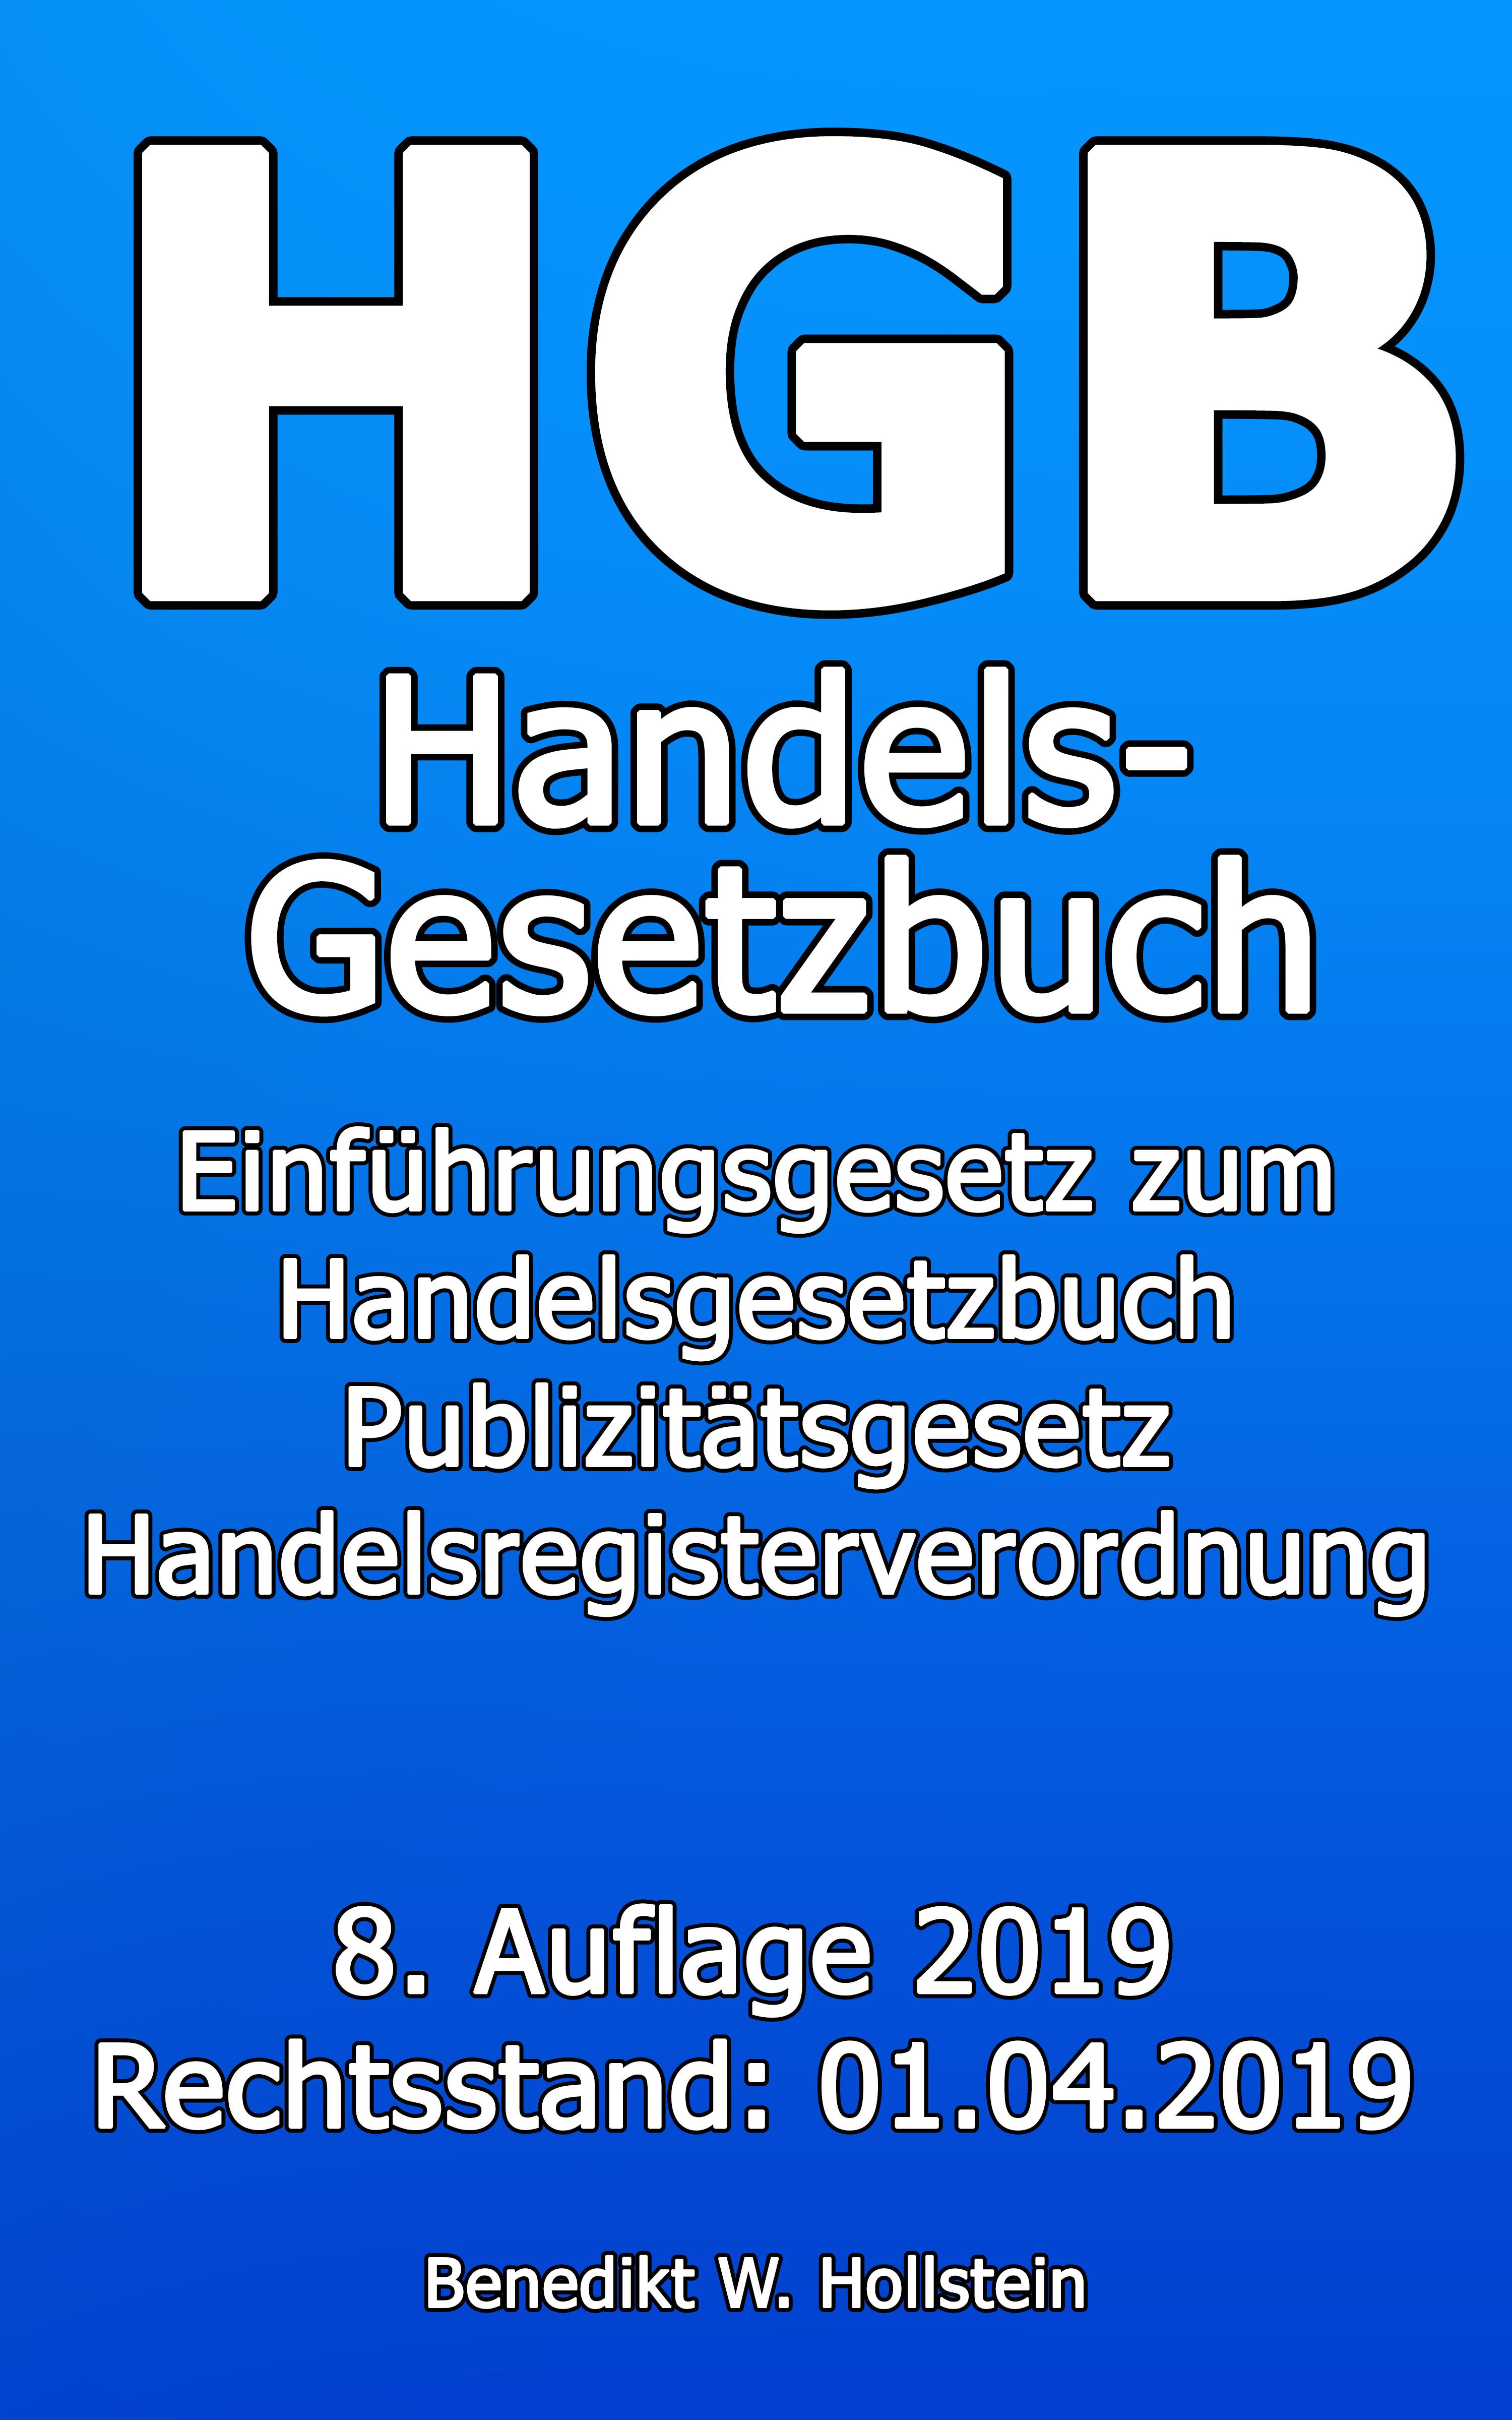 Benedikt W. Hollstein HGB Handelsgesetzbuch benedikt cyberspace first steps cloth